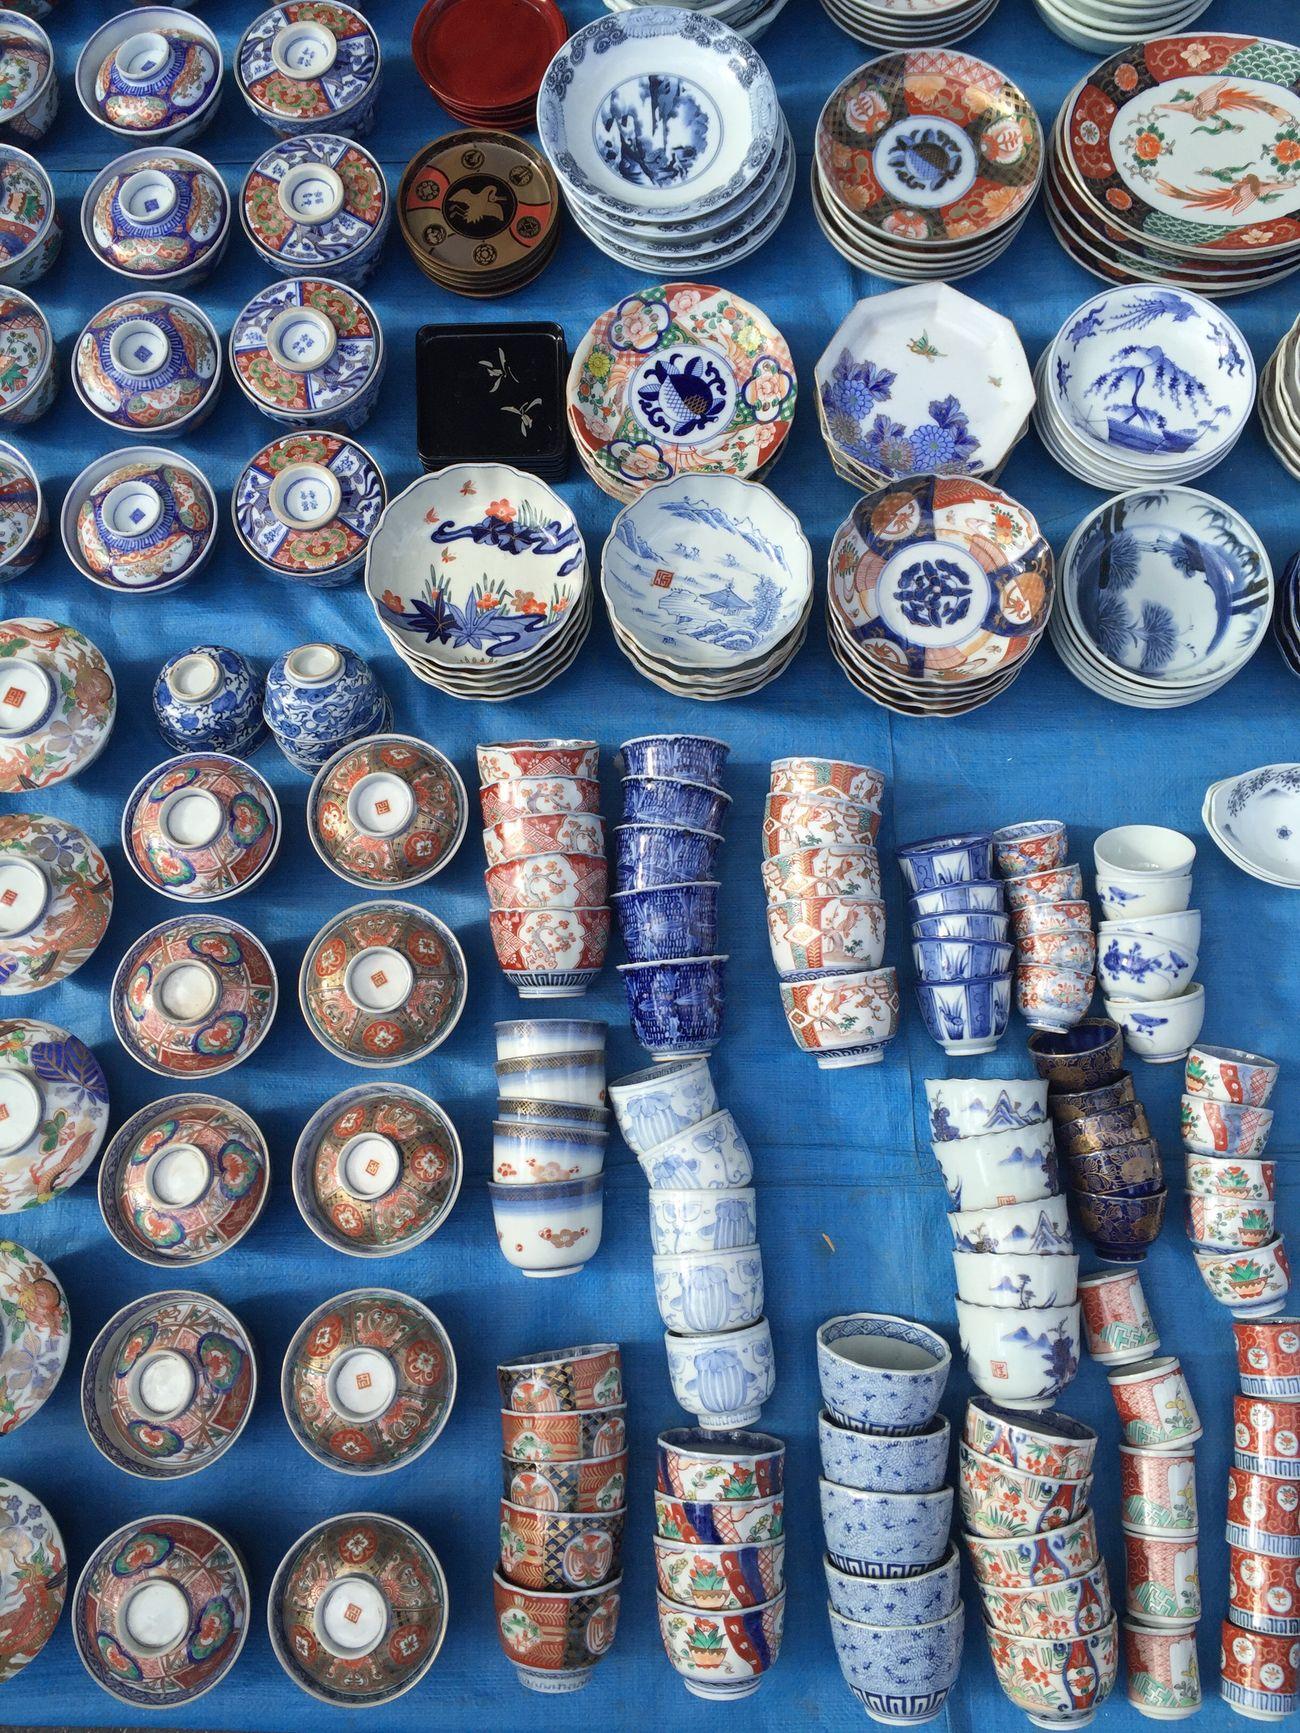 Fleamarket Flea Markets Kyoto Pottery Art Tradition White Pattern For Sale Taking Pictures Hello World